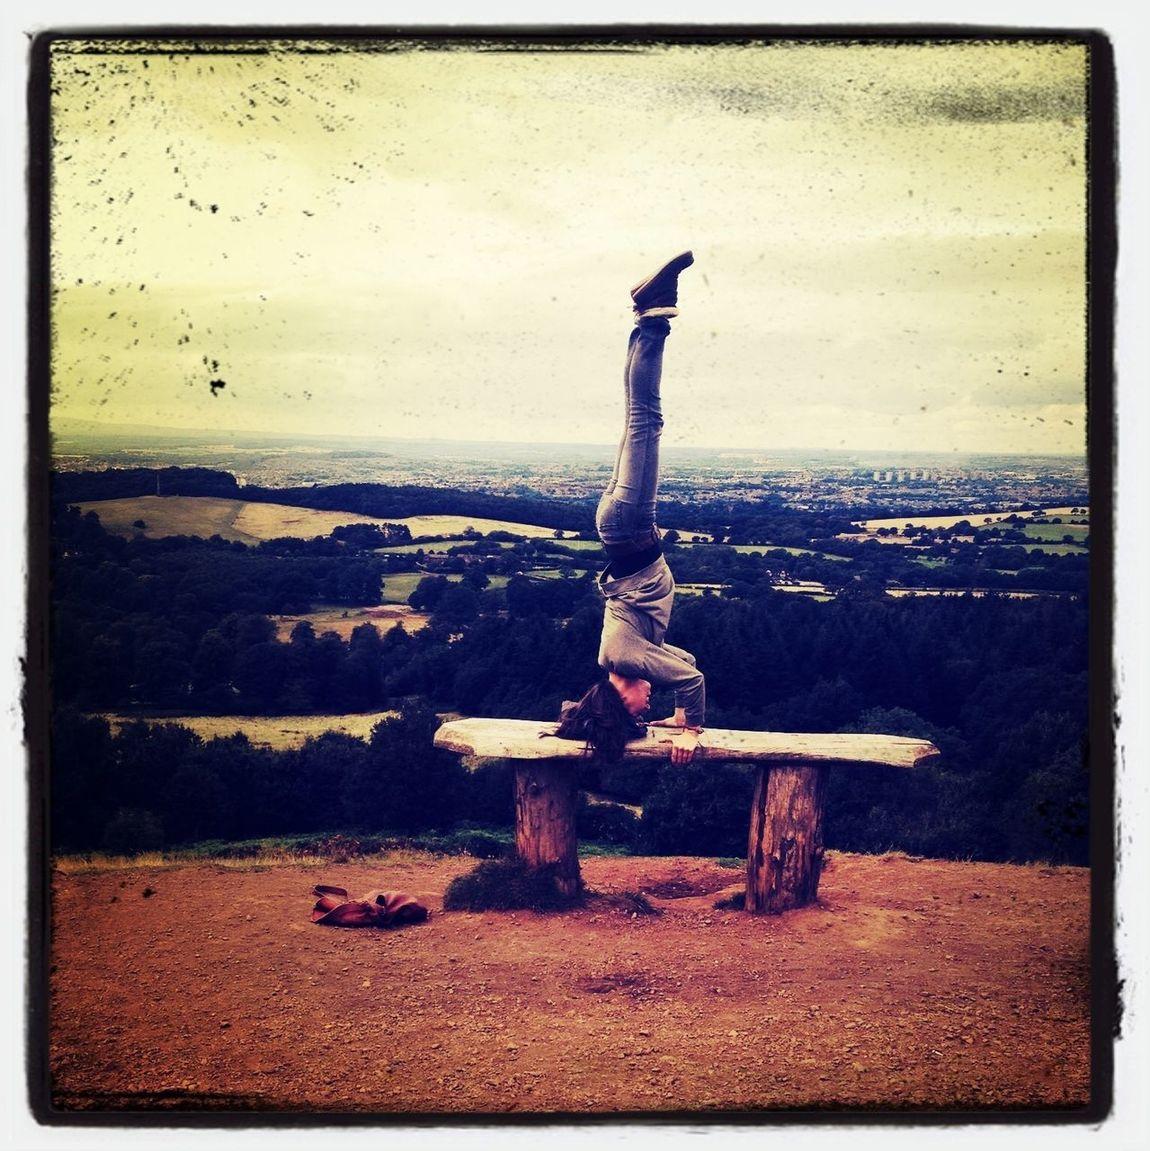 Take A Break Nice Views My Feet Hurt Enjoying The Sights Benching, inspired by...Richard Edwards